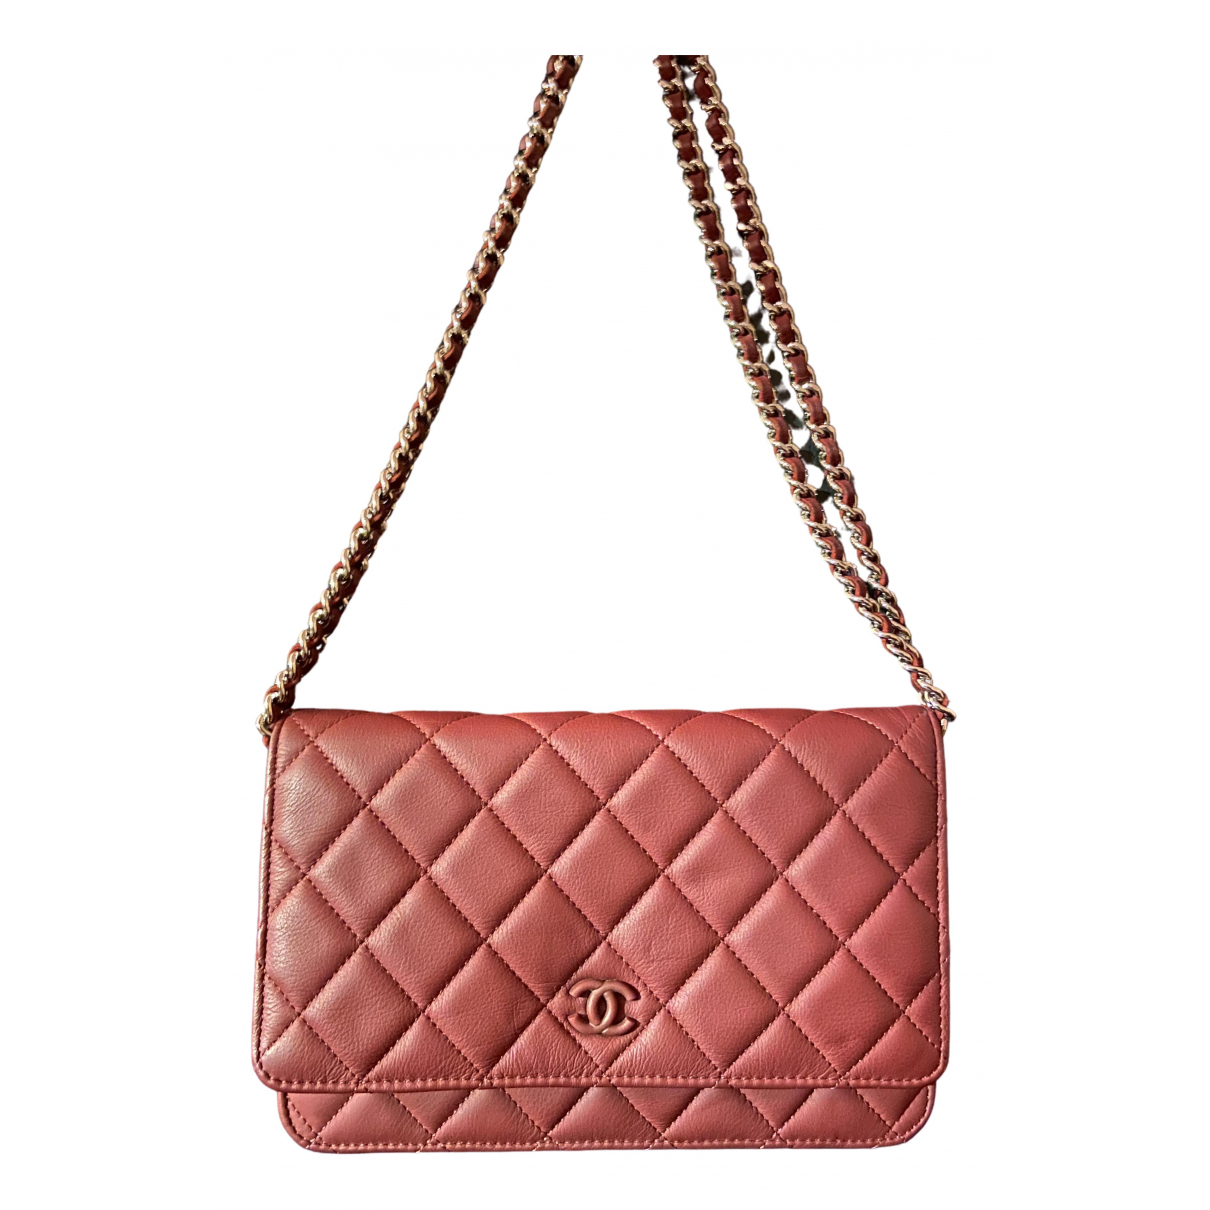 Chanel Wallet on Chain Burgundy Leather handbag for Women \N